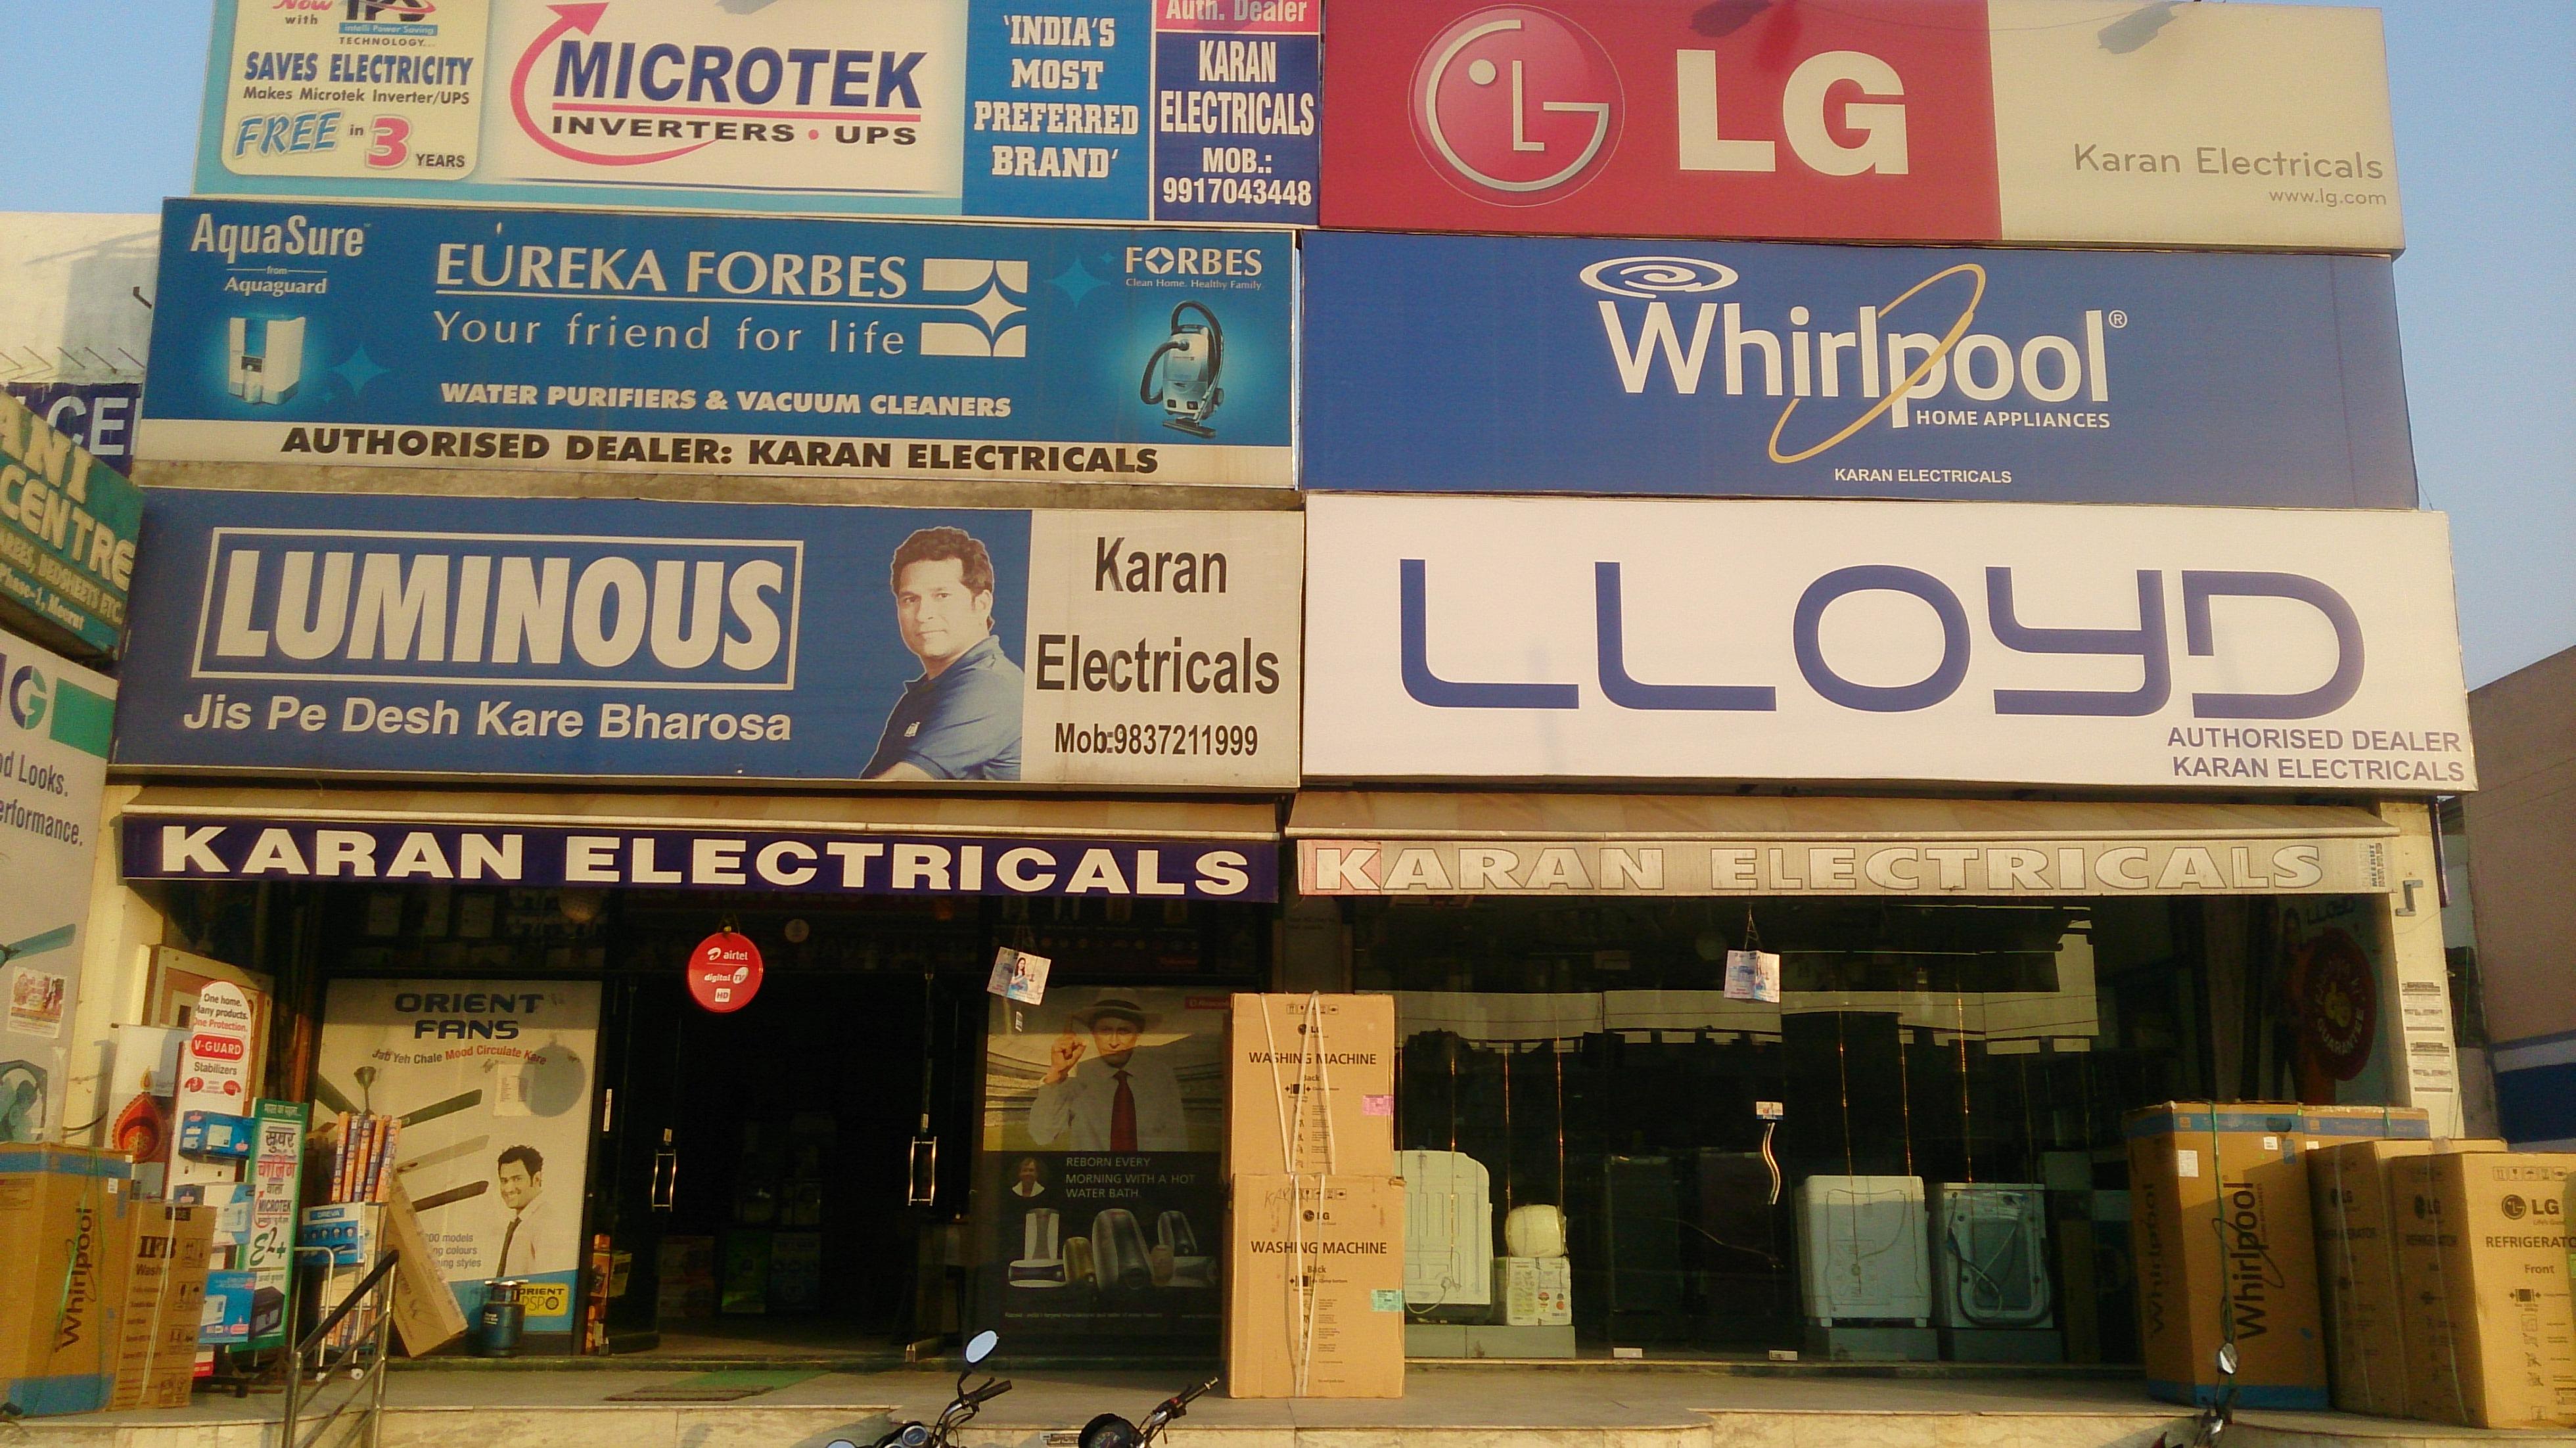 Karan Electricals